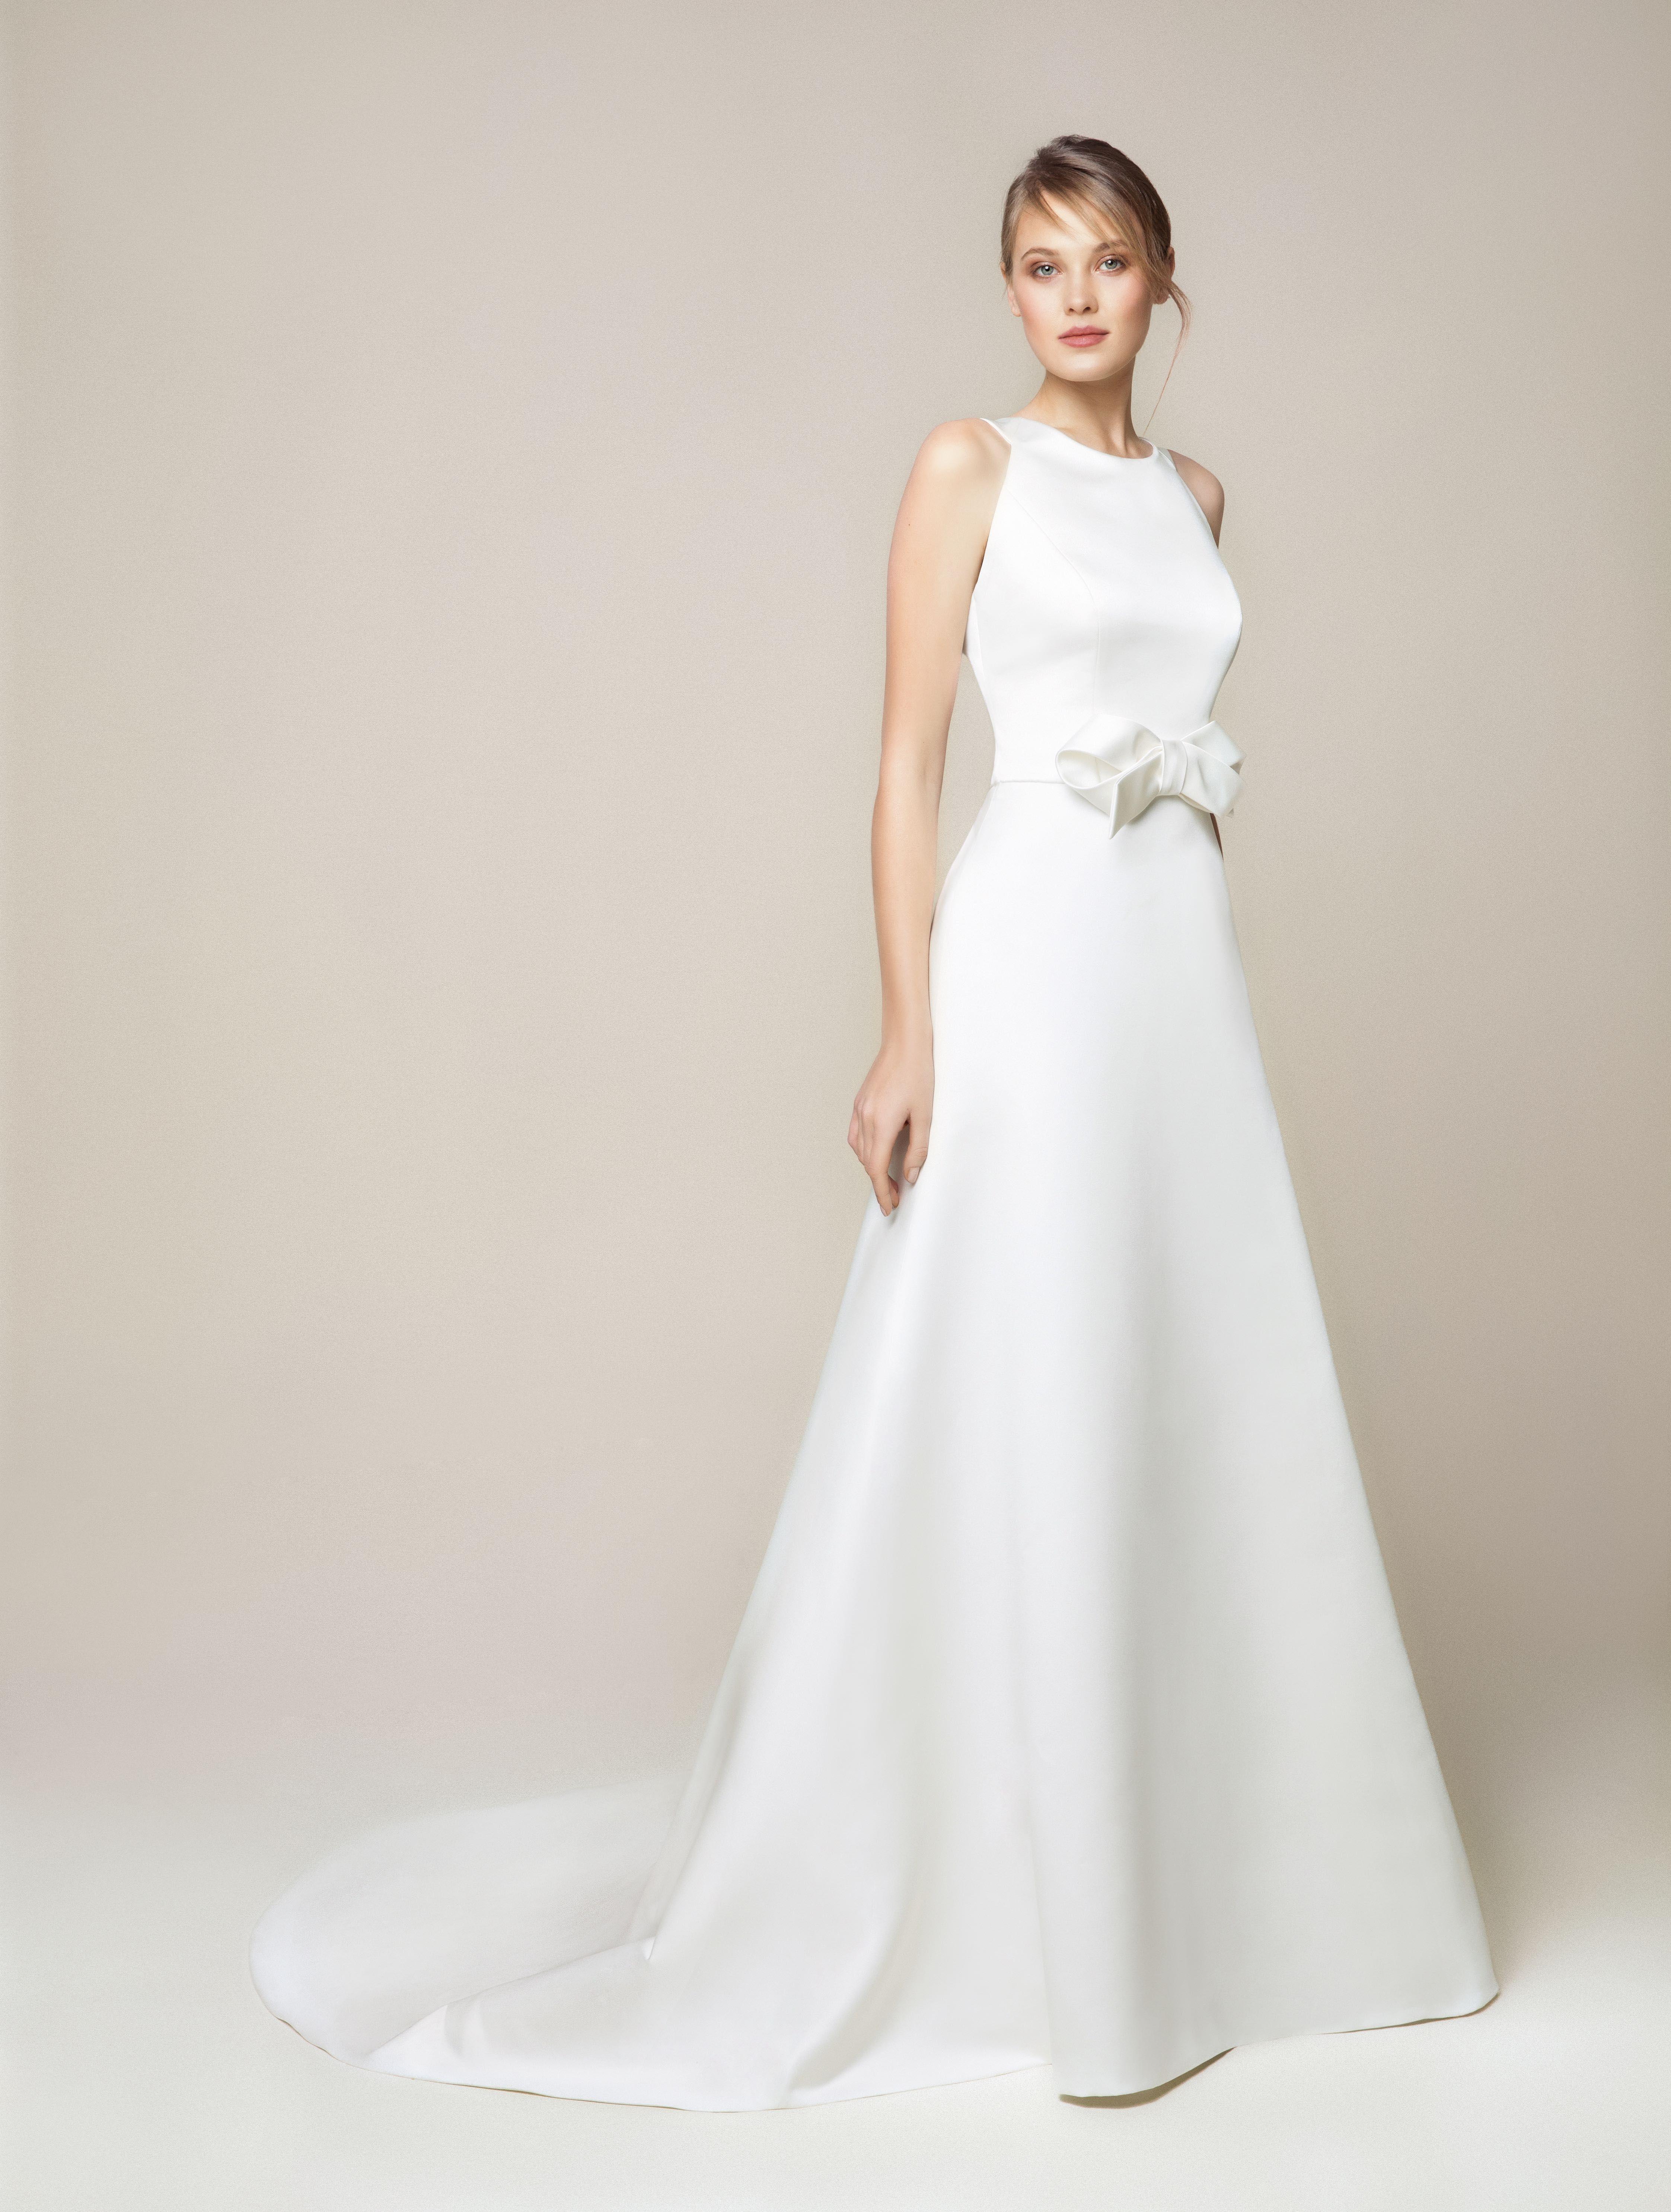 906 Bow Wedding Dress Wedding Dresses Cinderella Ball Gown Wedding Dress